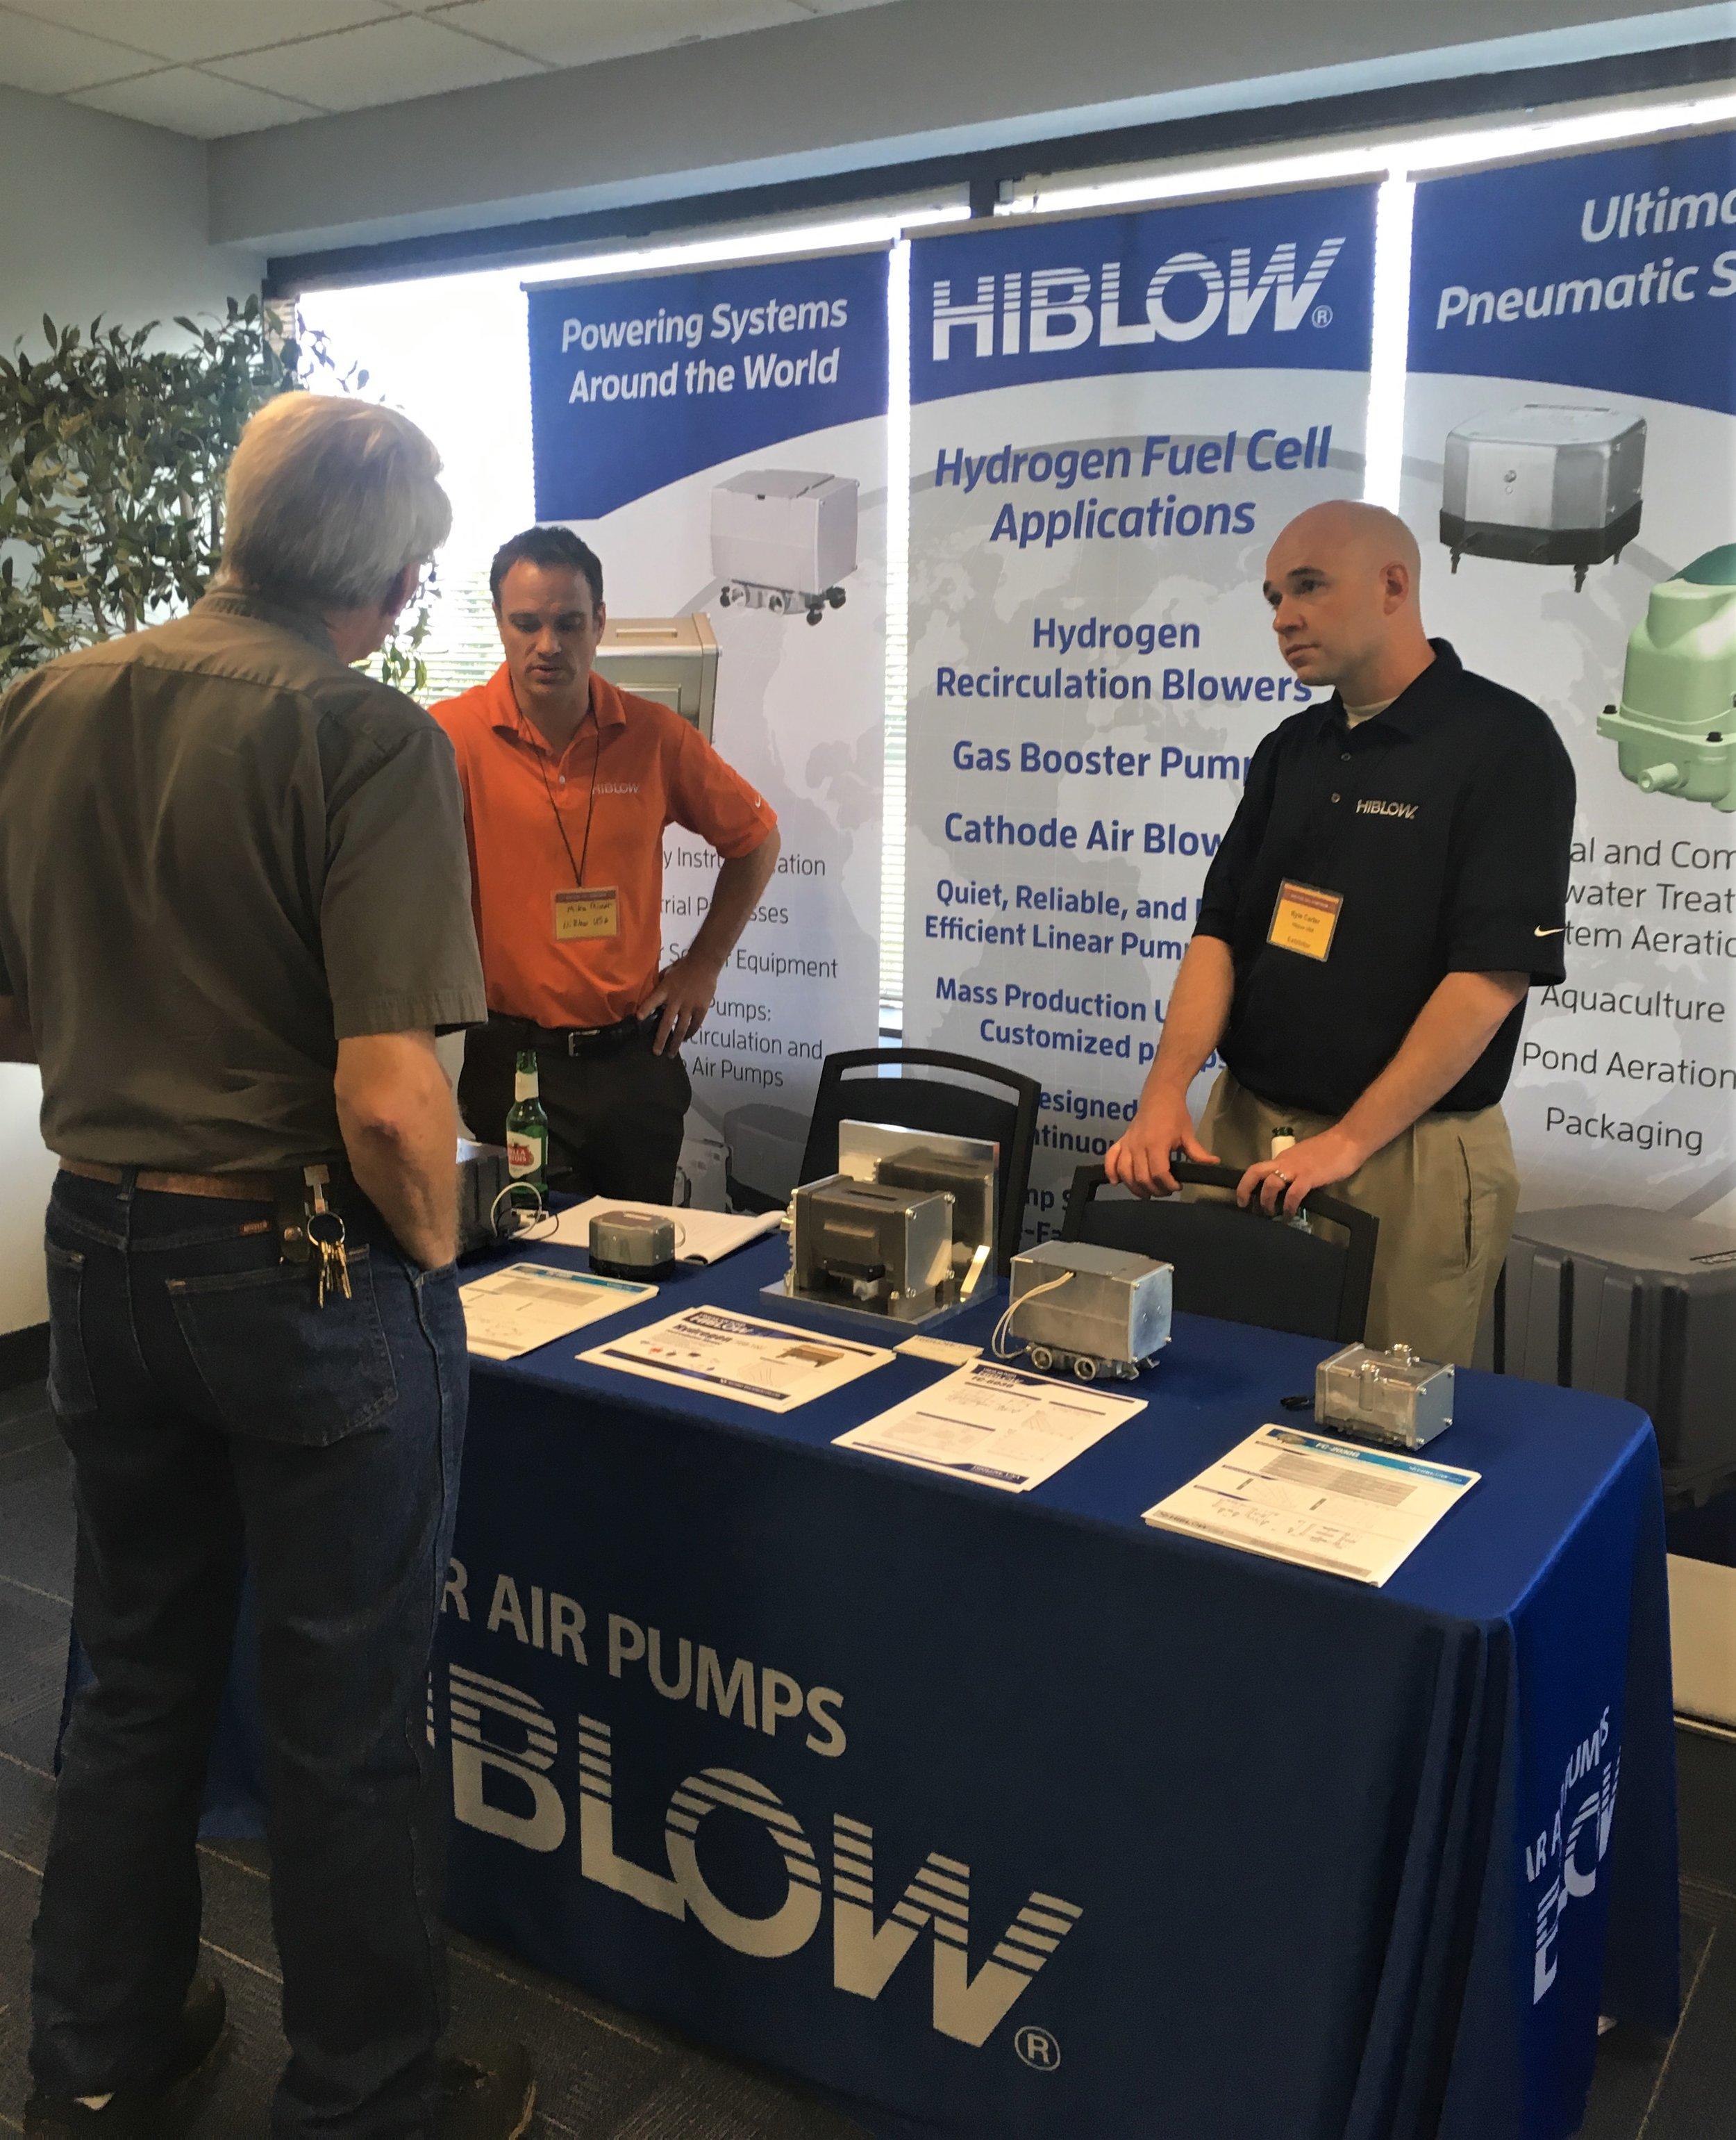 Hiblow-USA Exhibit